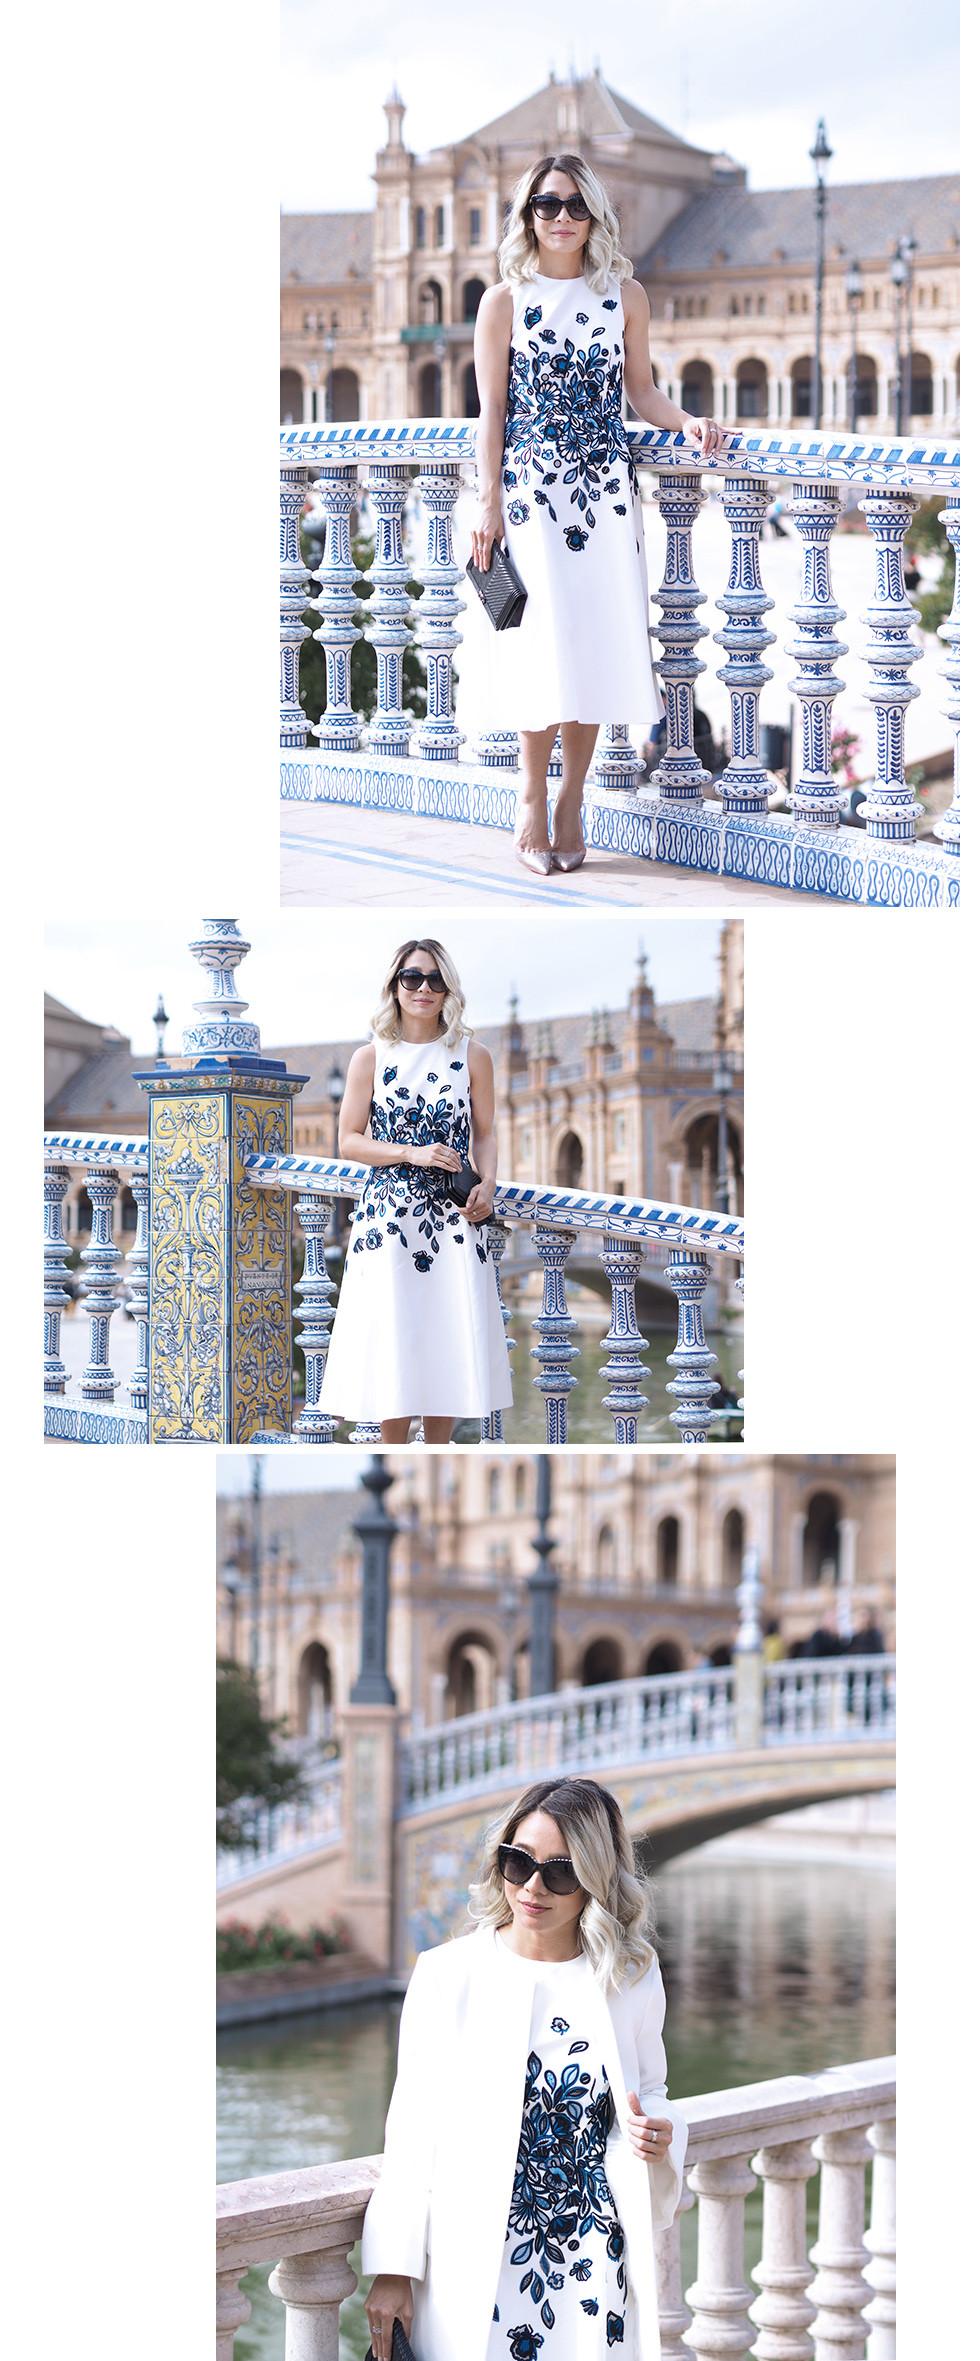 Plaza de España | Lam in Louboutins